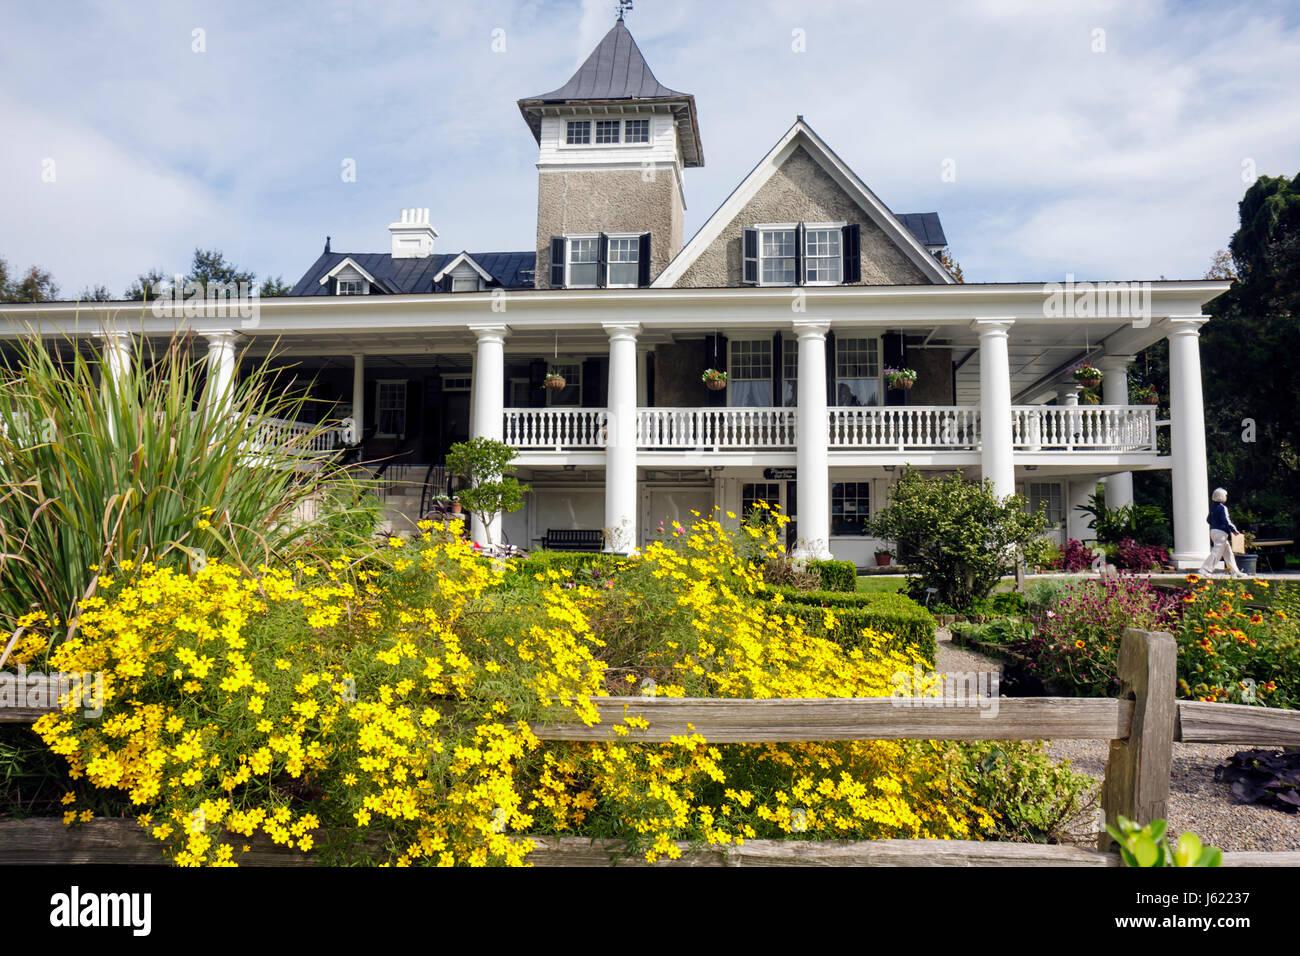 Charleston South Carolina Lowcountry Ashley River Road Magnolia Plantation and Gardens 1676 Drayton Family National - Stock Image